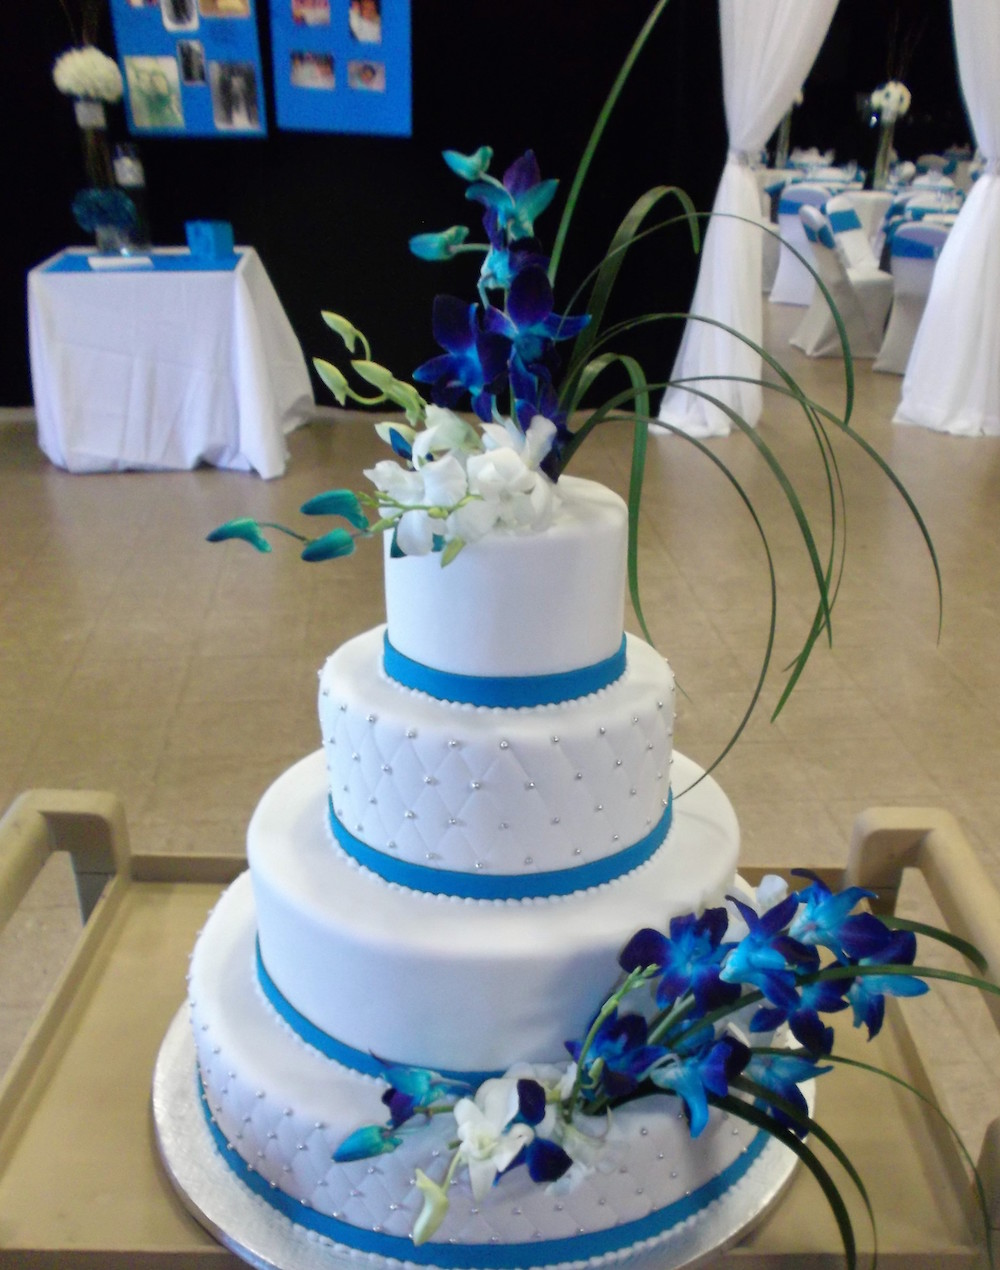 Wedding Cake Ruban Bleu Ciel Pièce Montée De Mariage Gâteau De Mariage Gateaucreateurfr